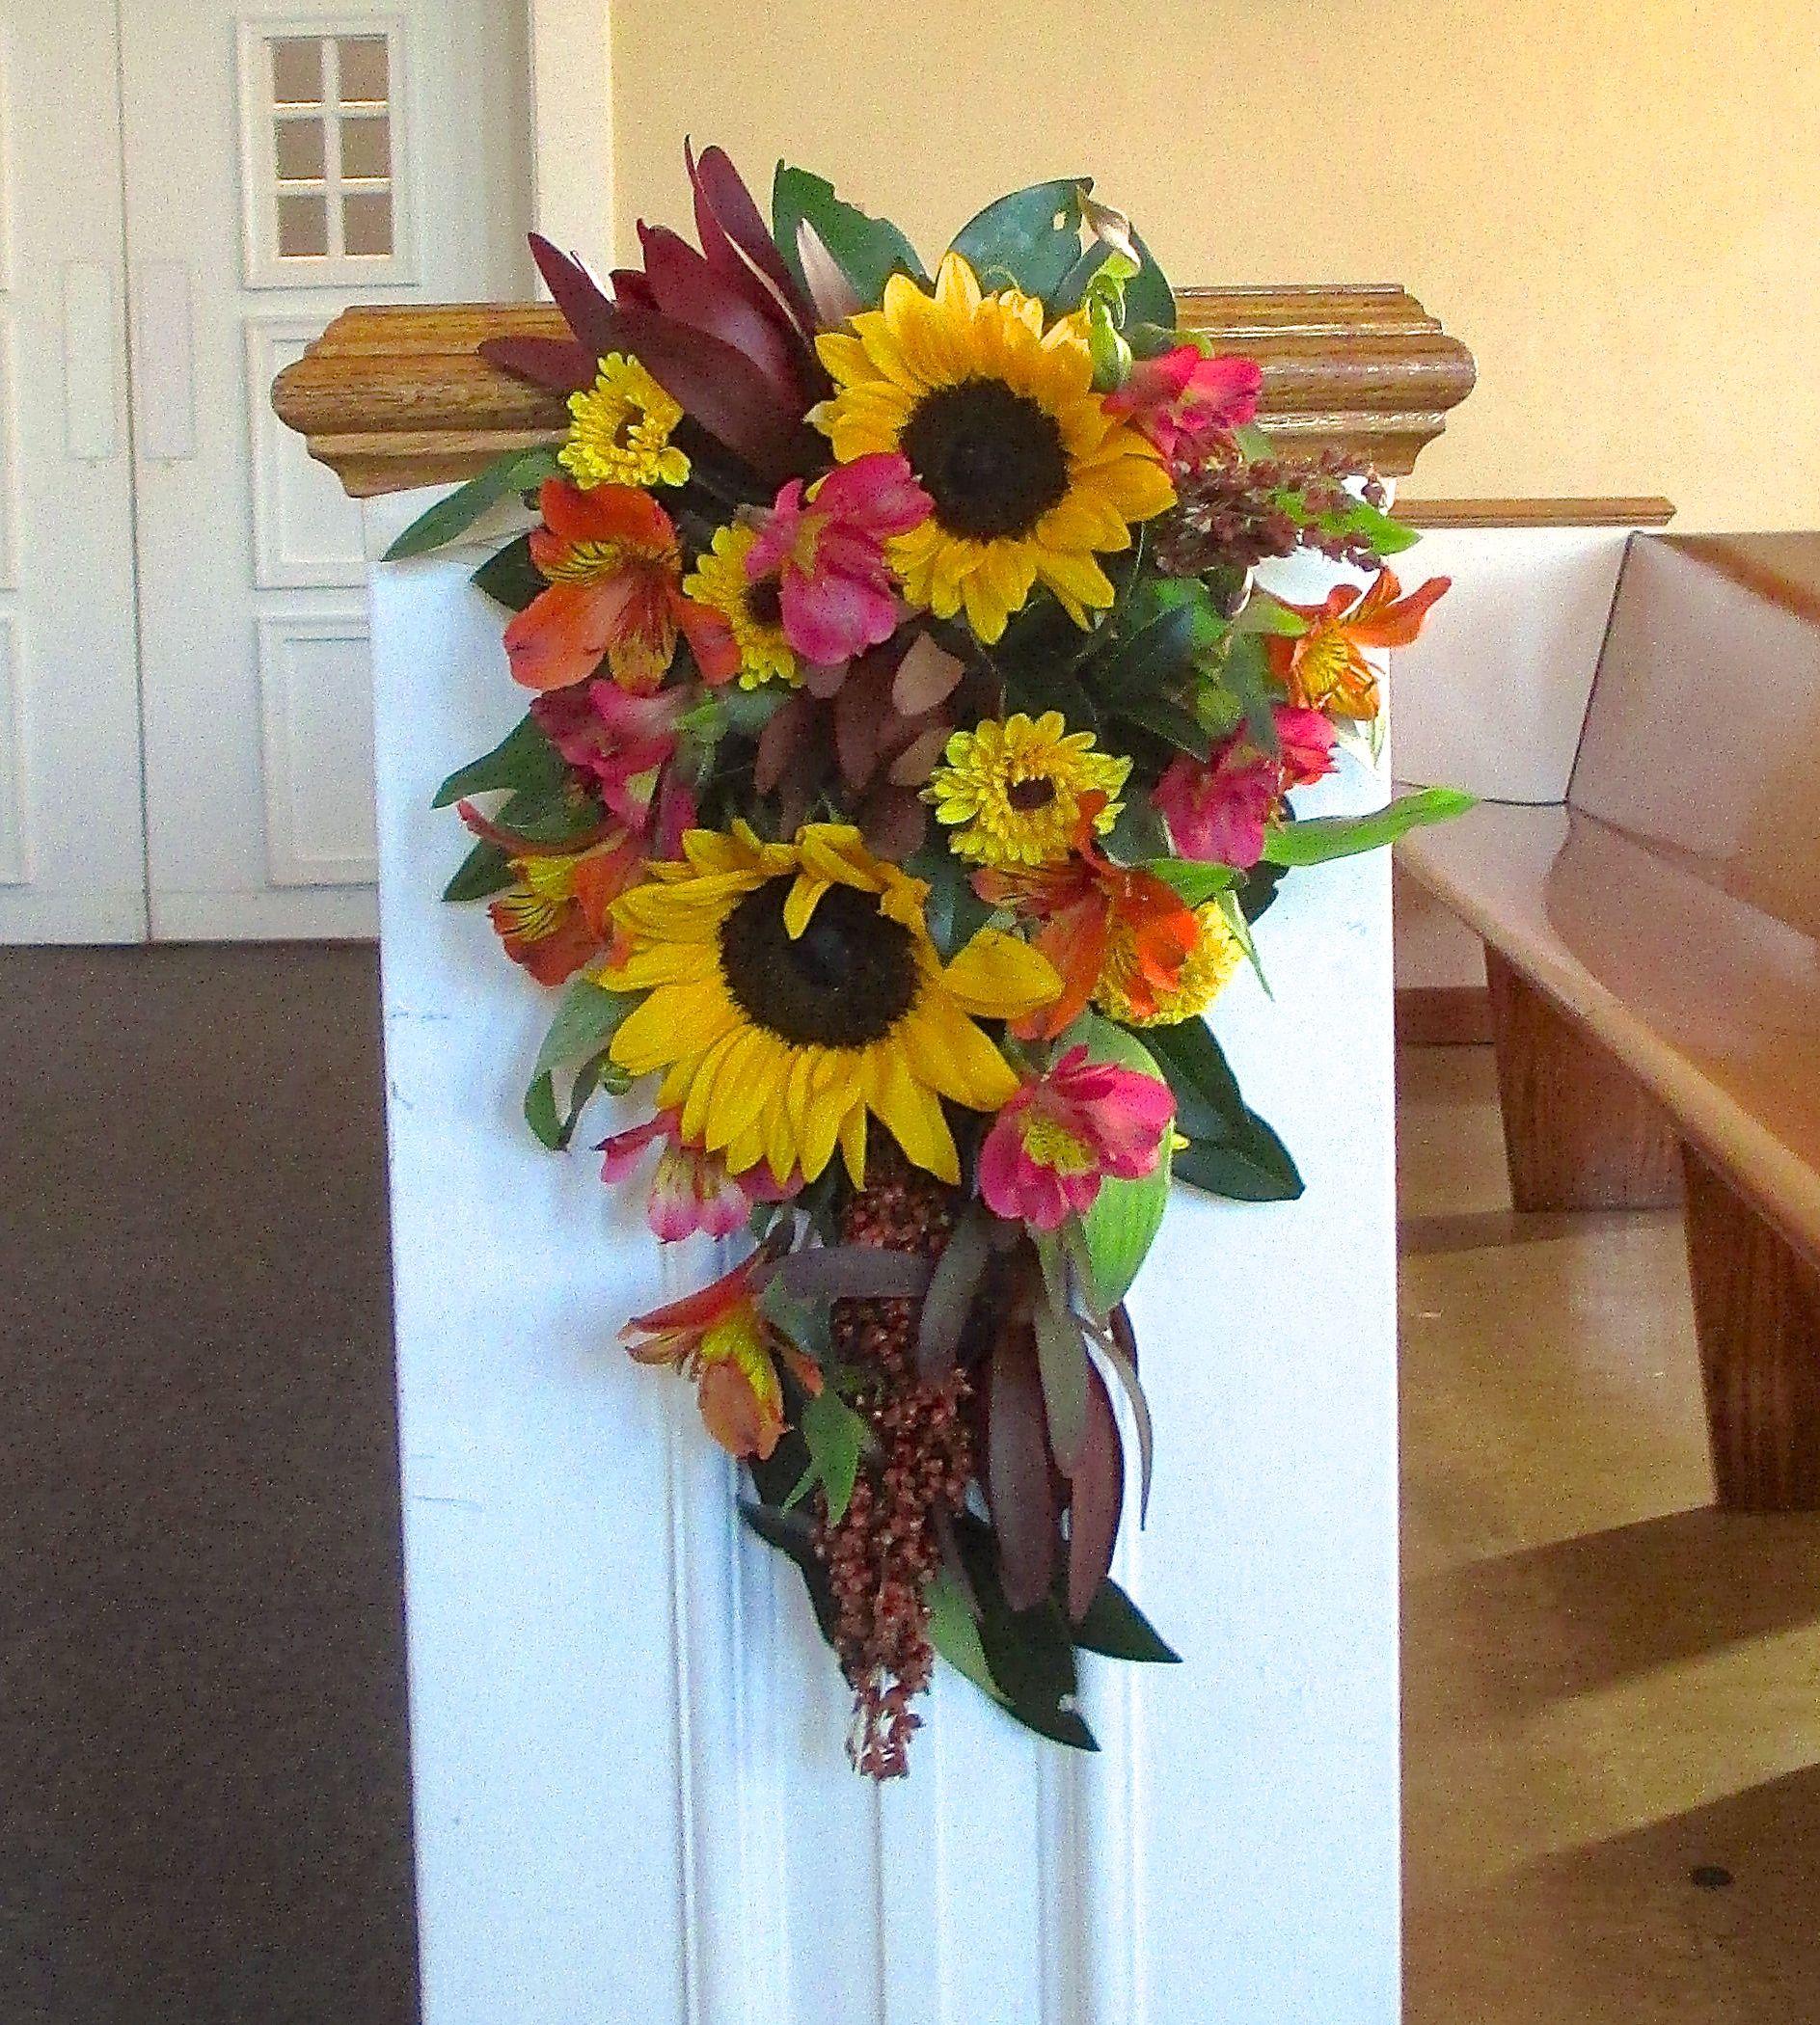 Wedding Flowers For November: Pew Flowers With Yellow Sunflowers, Mums, Burgundy Safari